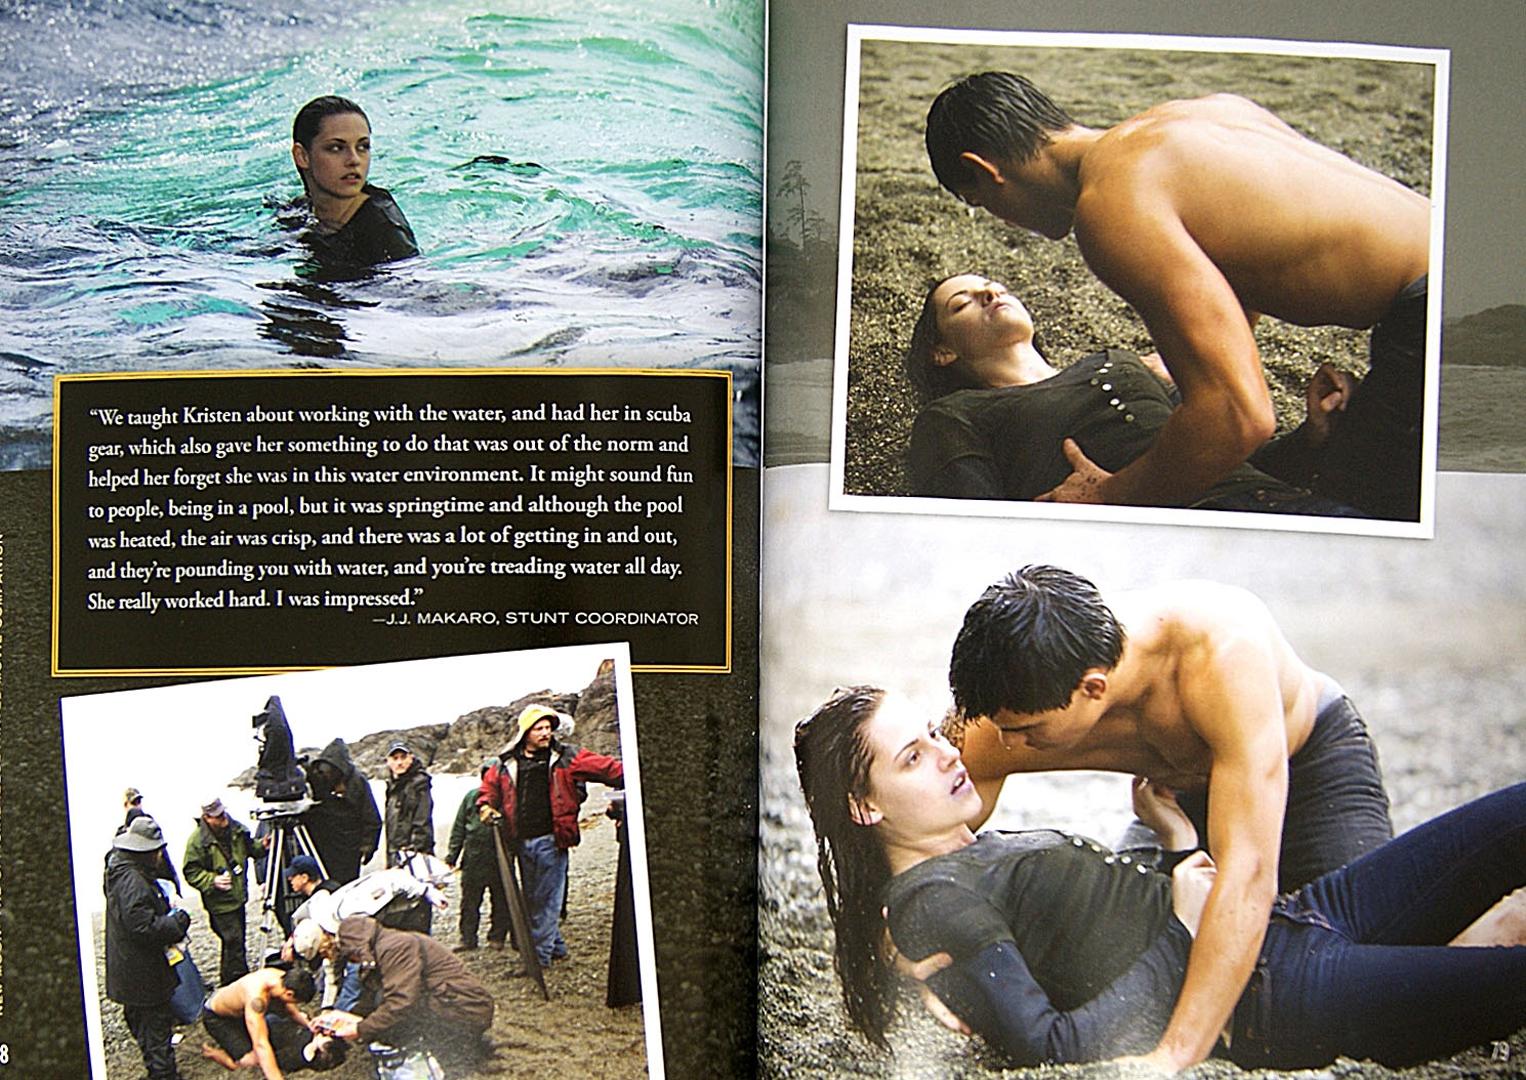 Иллюстрация 1 из 2 для Twilight Saga. New Moon. The Official Illustrated Movie Companion - Stephenie Meyer | Лабиринт - книги. Источник: Лабиринт